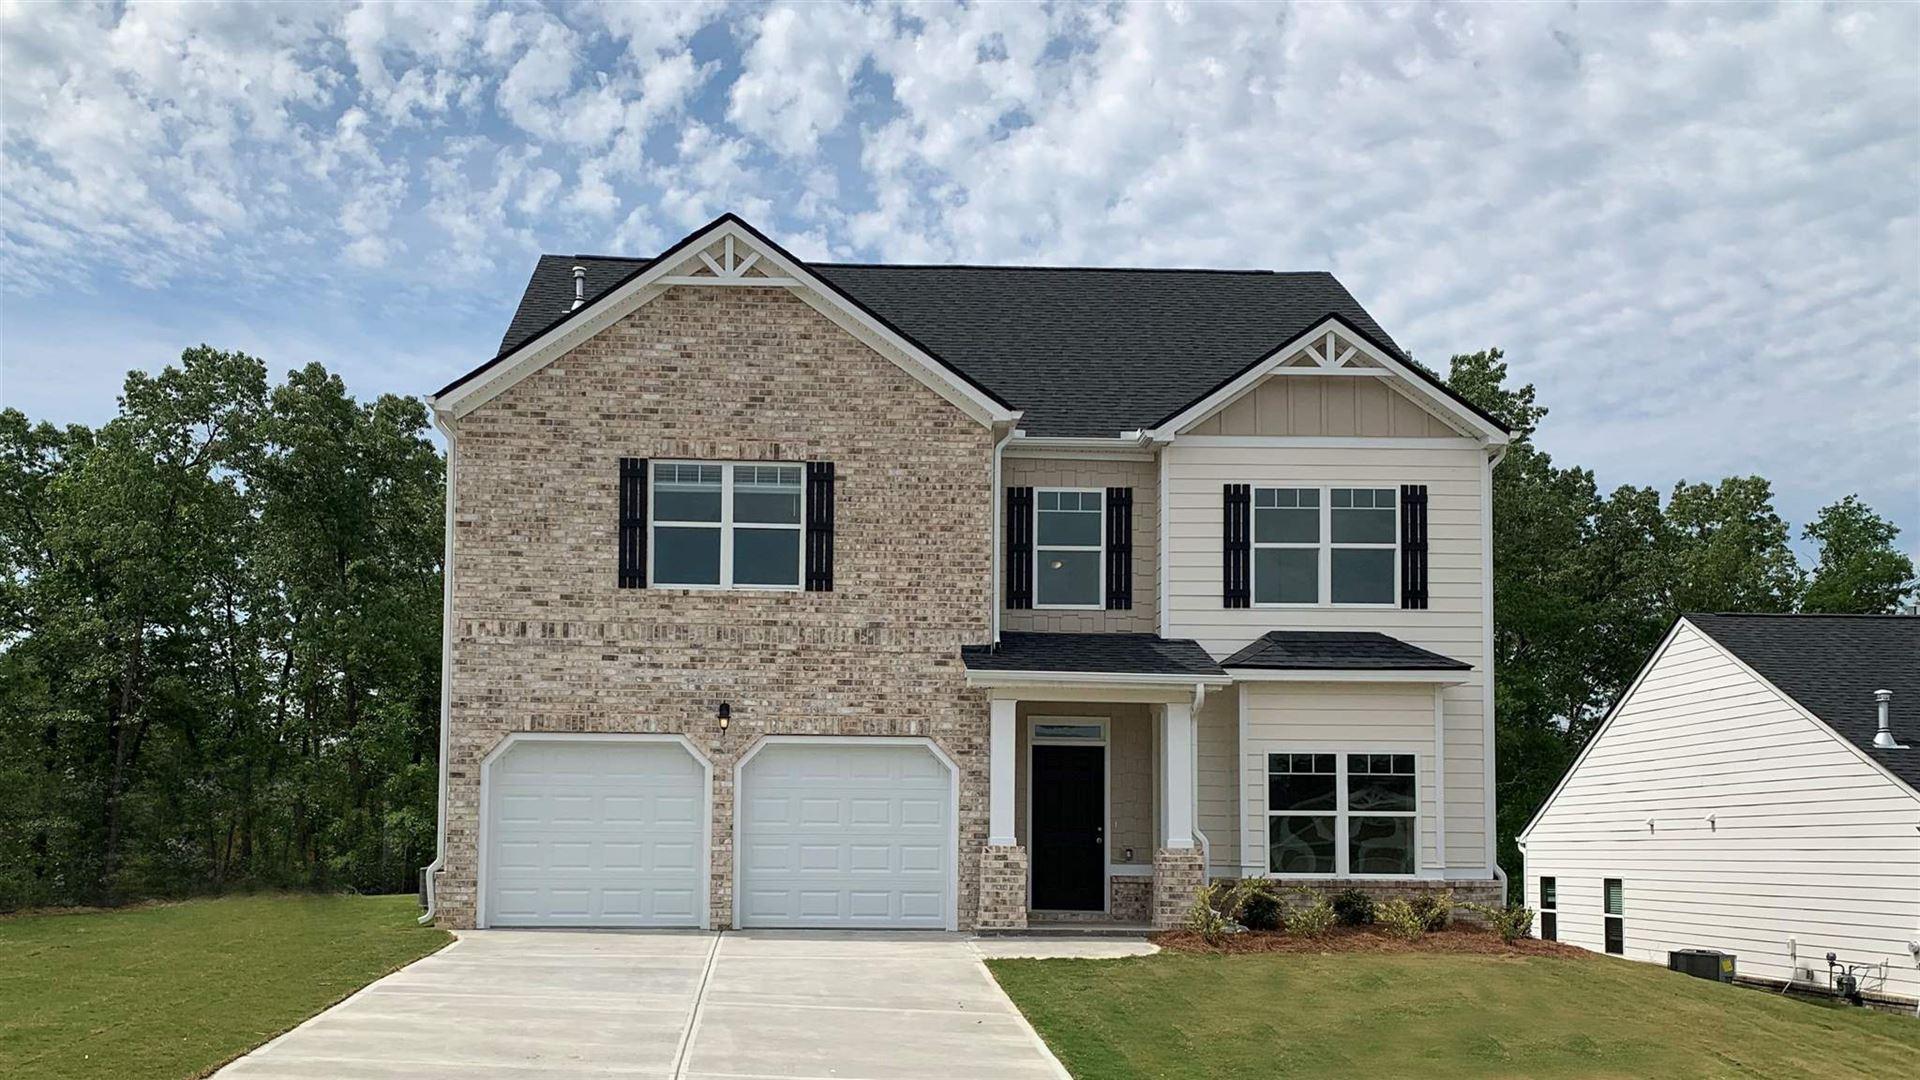 1717 Danville, McDonough, GA 30253 - #: 8825455